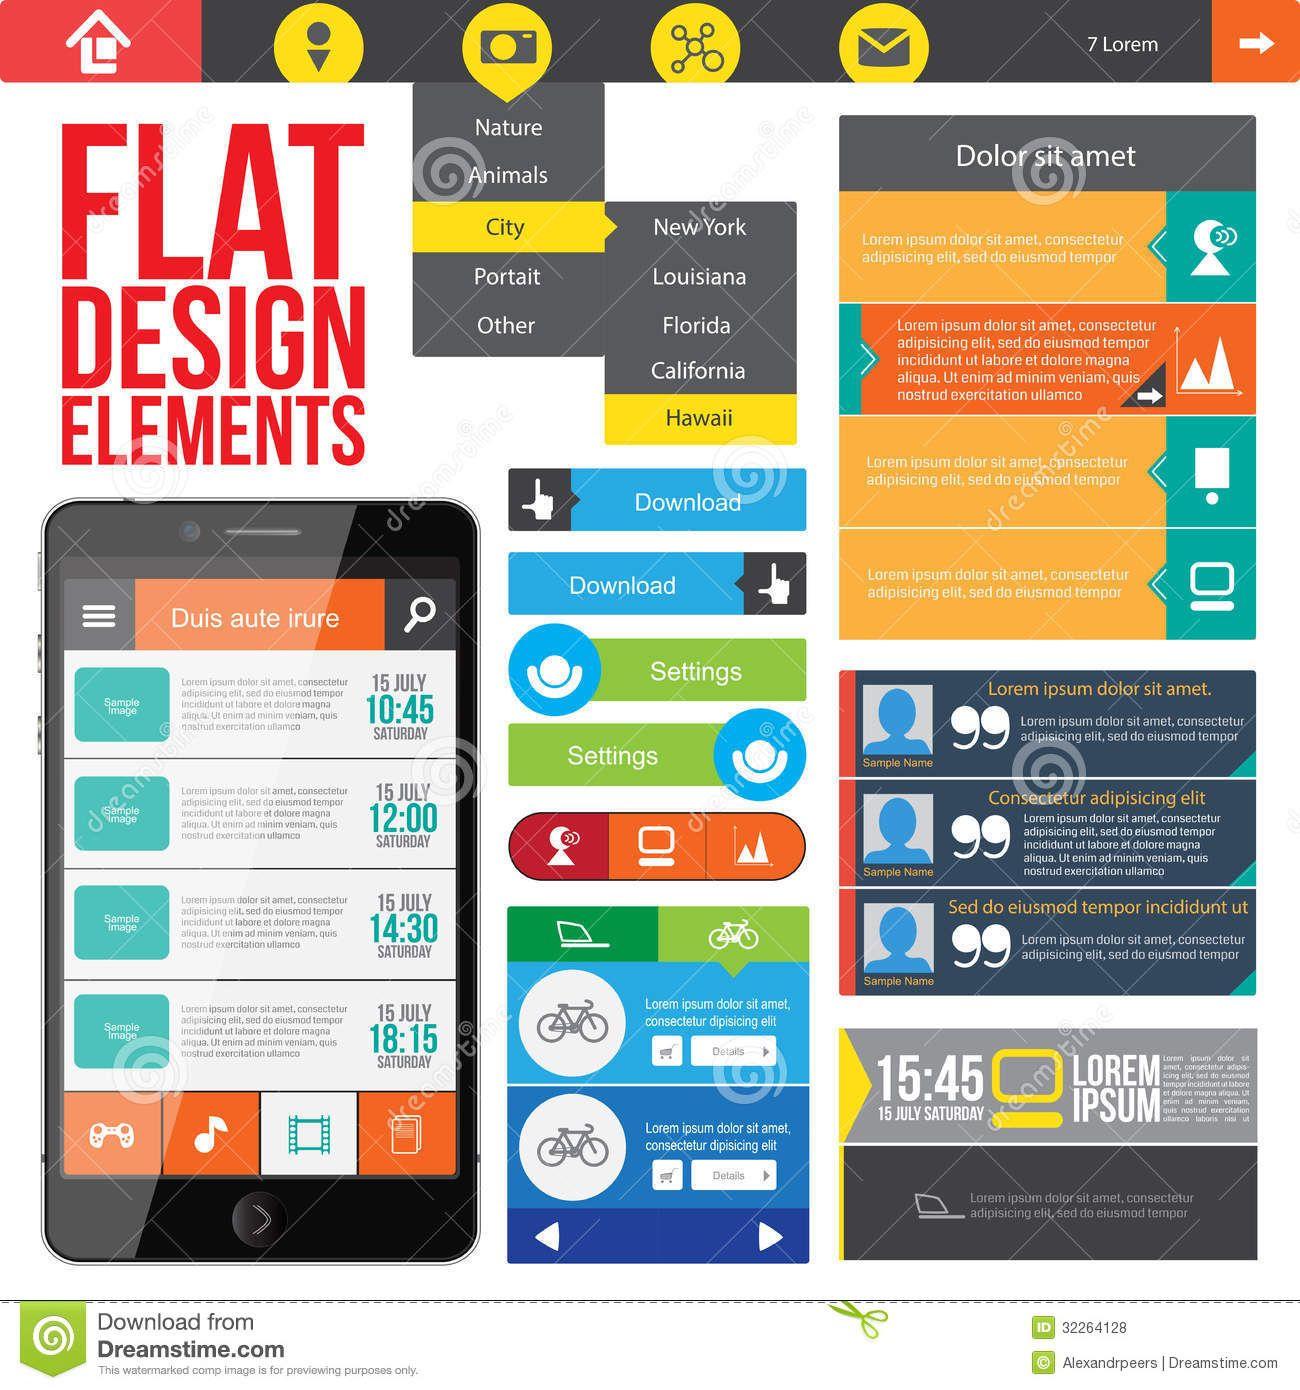 Free Web Design Elements Flat Web Design Web Design Free Web Design